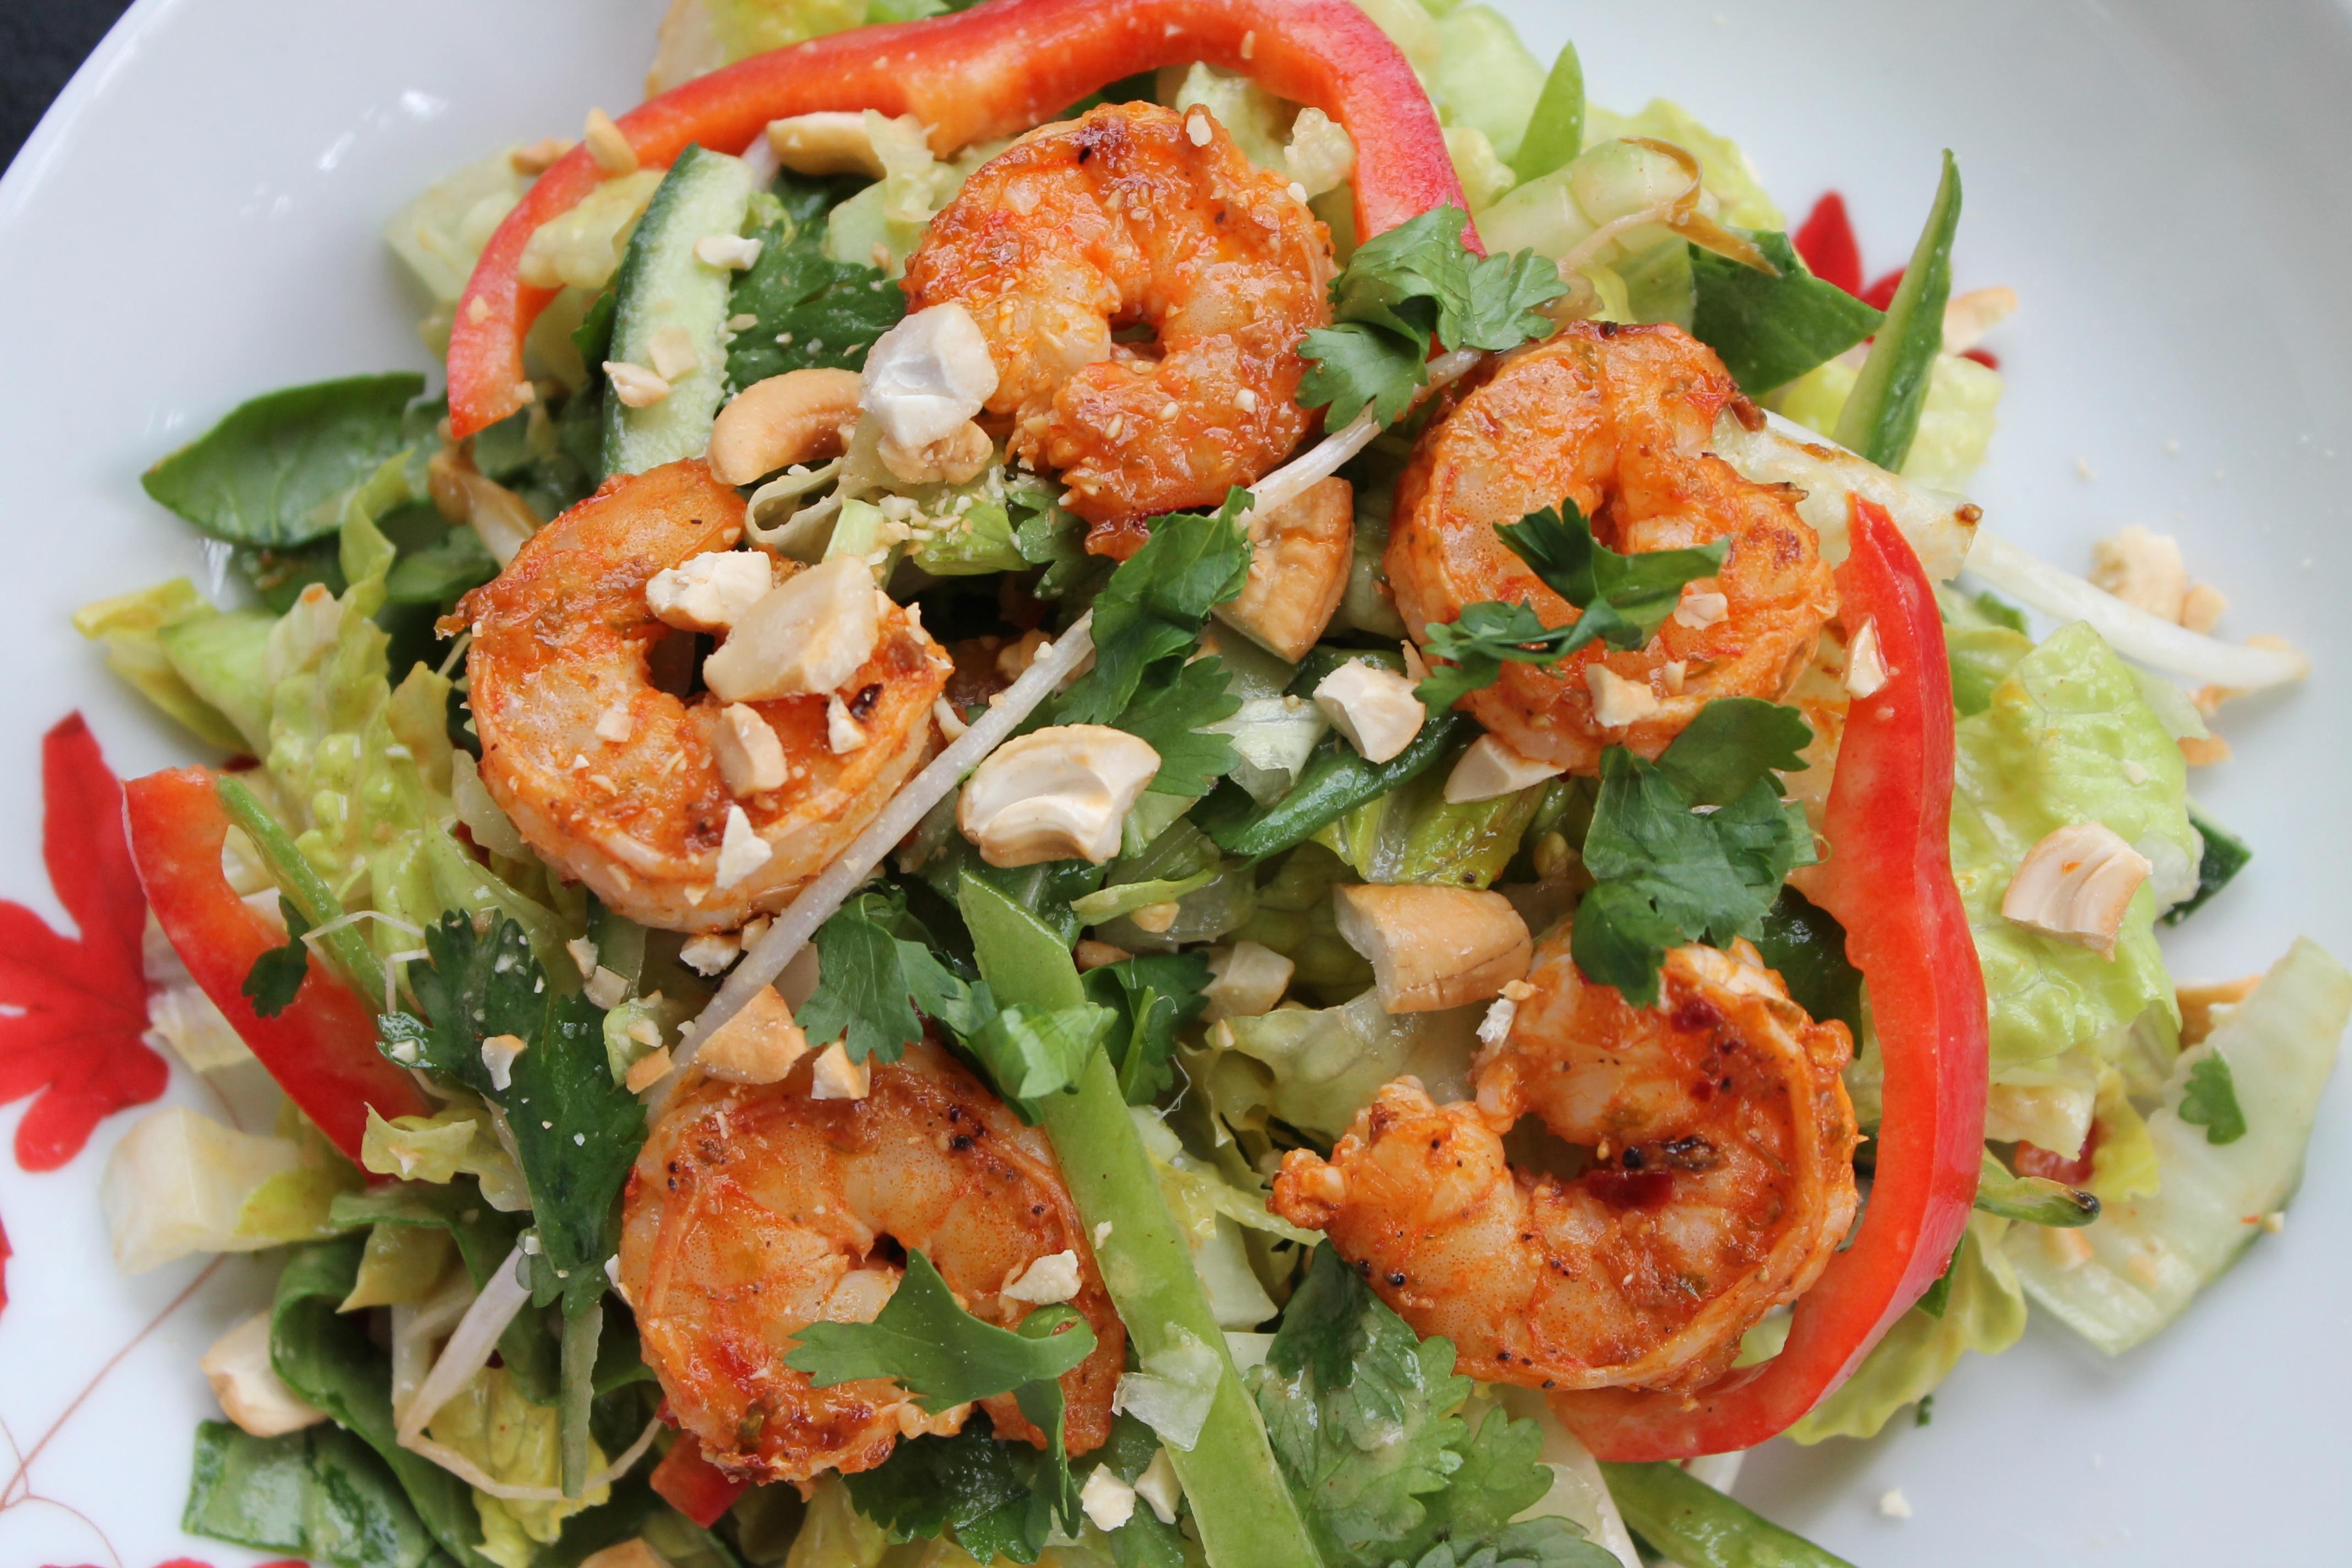 Thai Shrimp Salad with Sesame Peanut Dressing